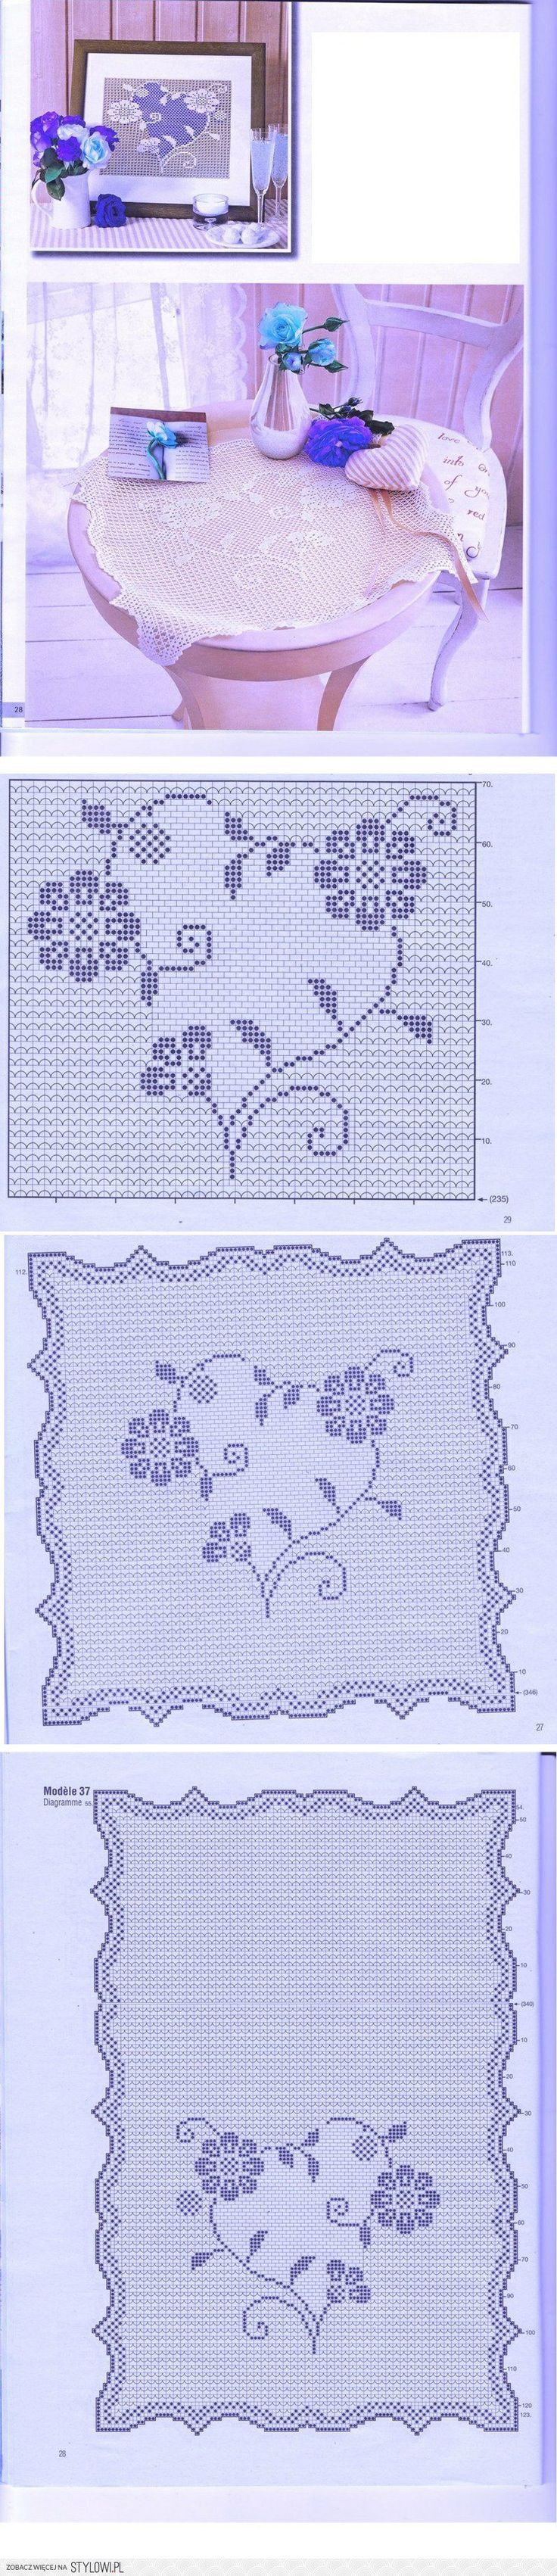 585 besten Crochet - Filet doily Bilder auf Pinterest   Häkeln ...